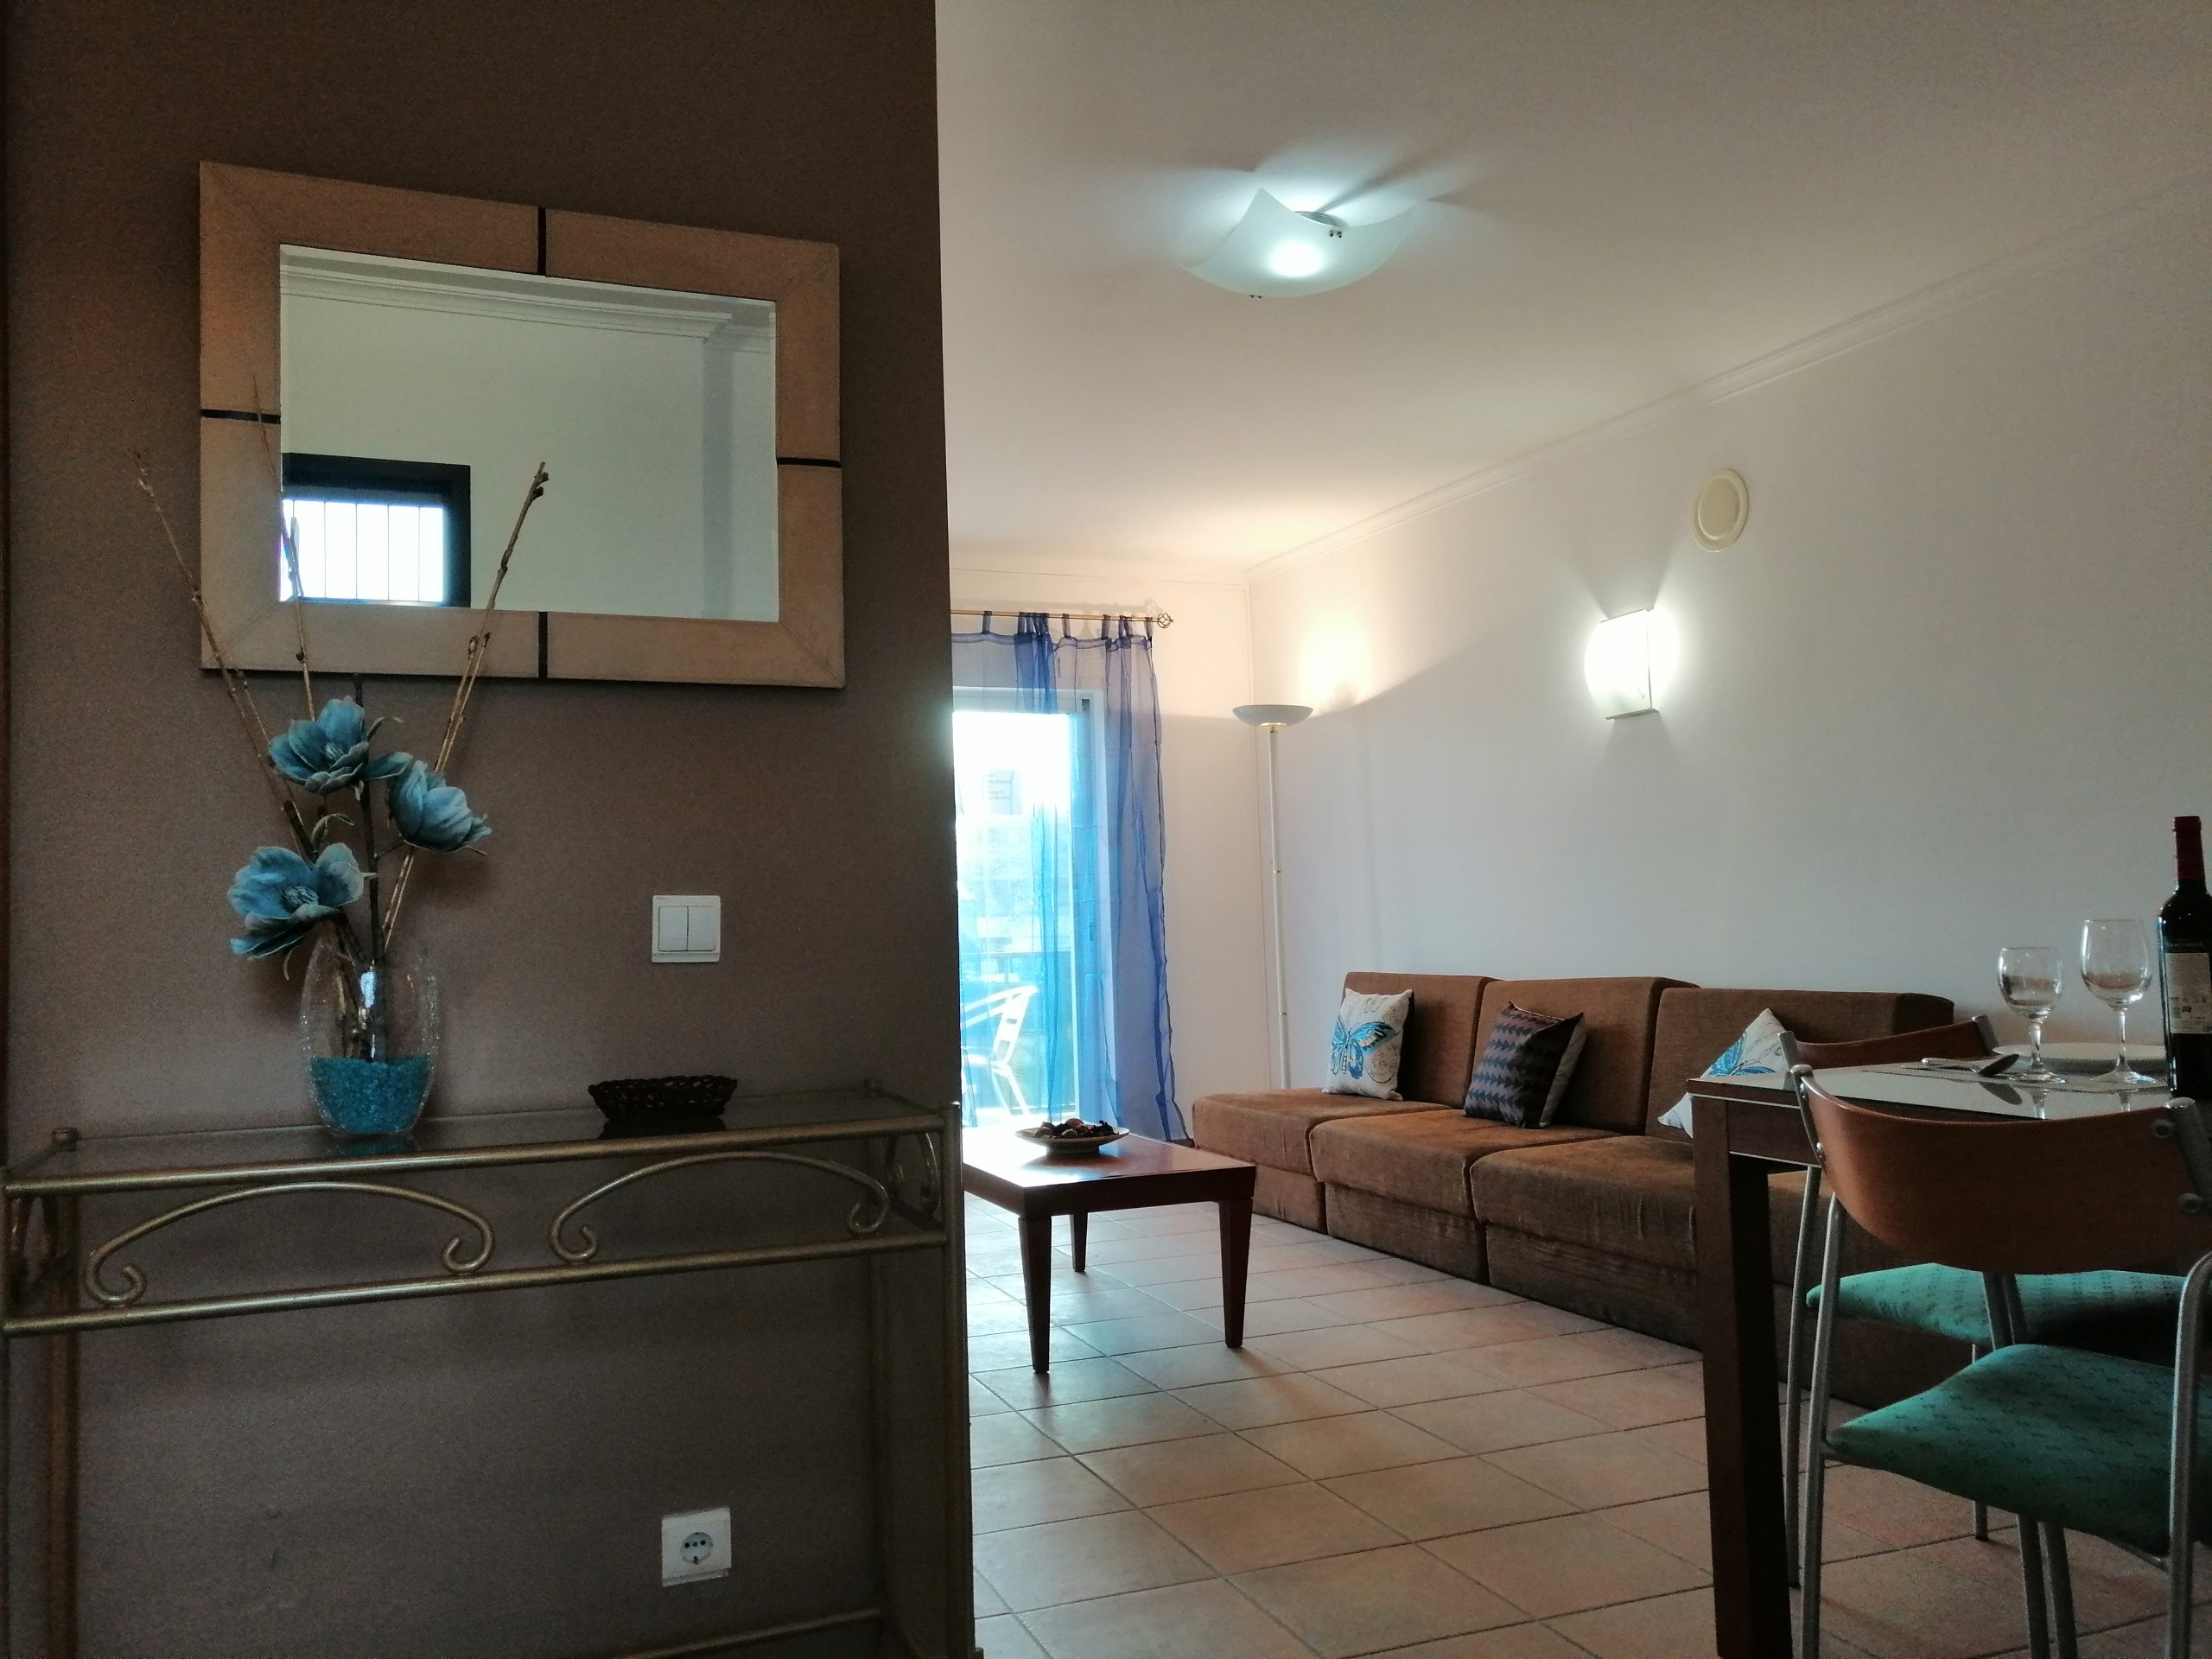 Holiday apartments and villas for rent, T1 Albufeira em cond. fechado c/ piscina 4/5 pessoas JUN / JUL / AGO / SET in Albufeira, Portugal Algarve, REF_IMG_14867_14883